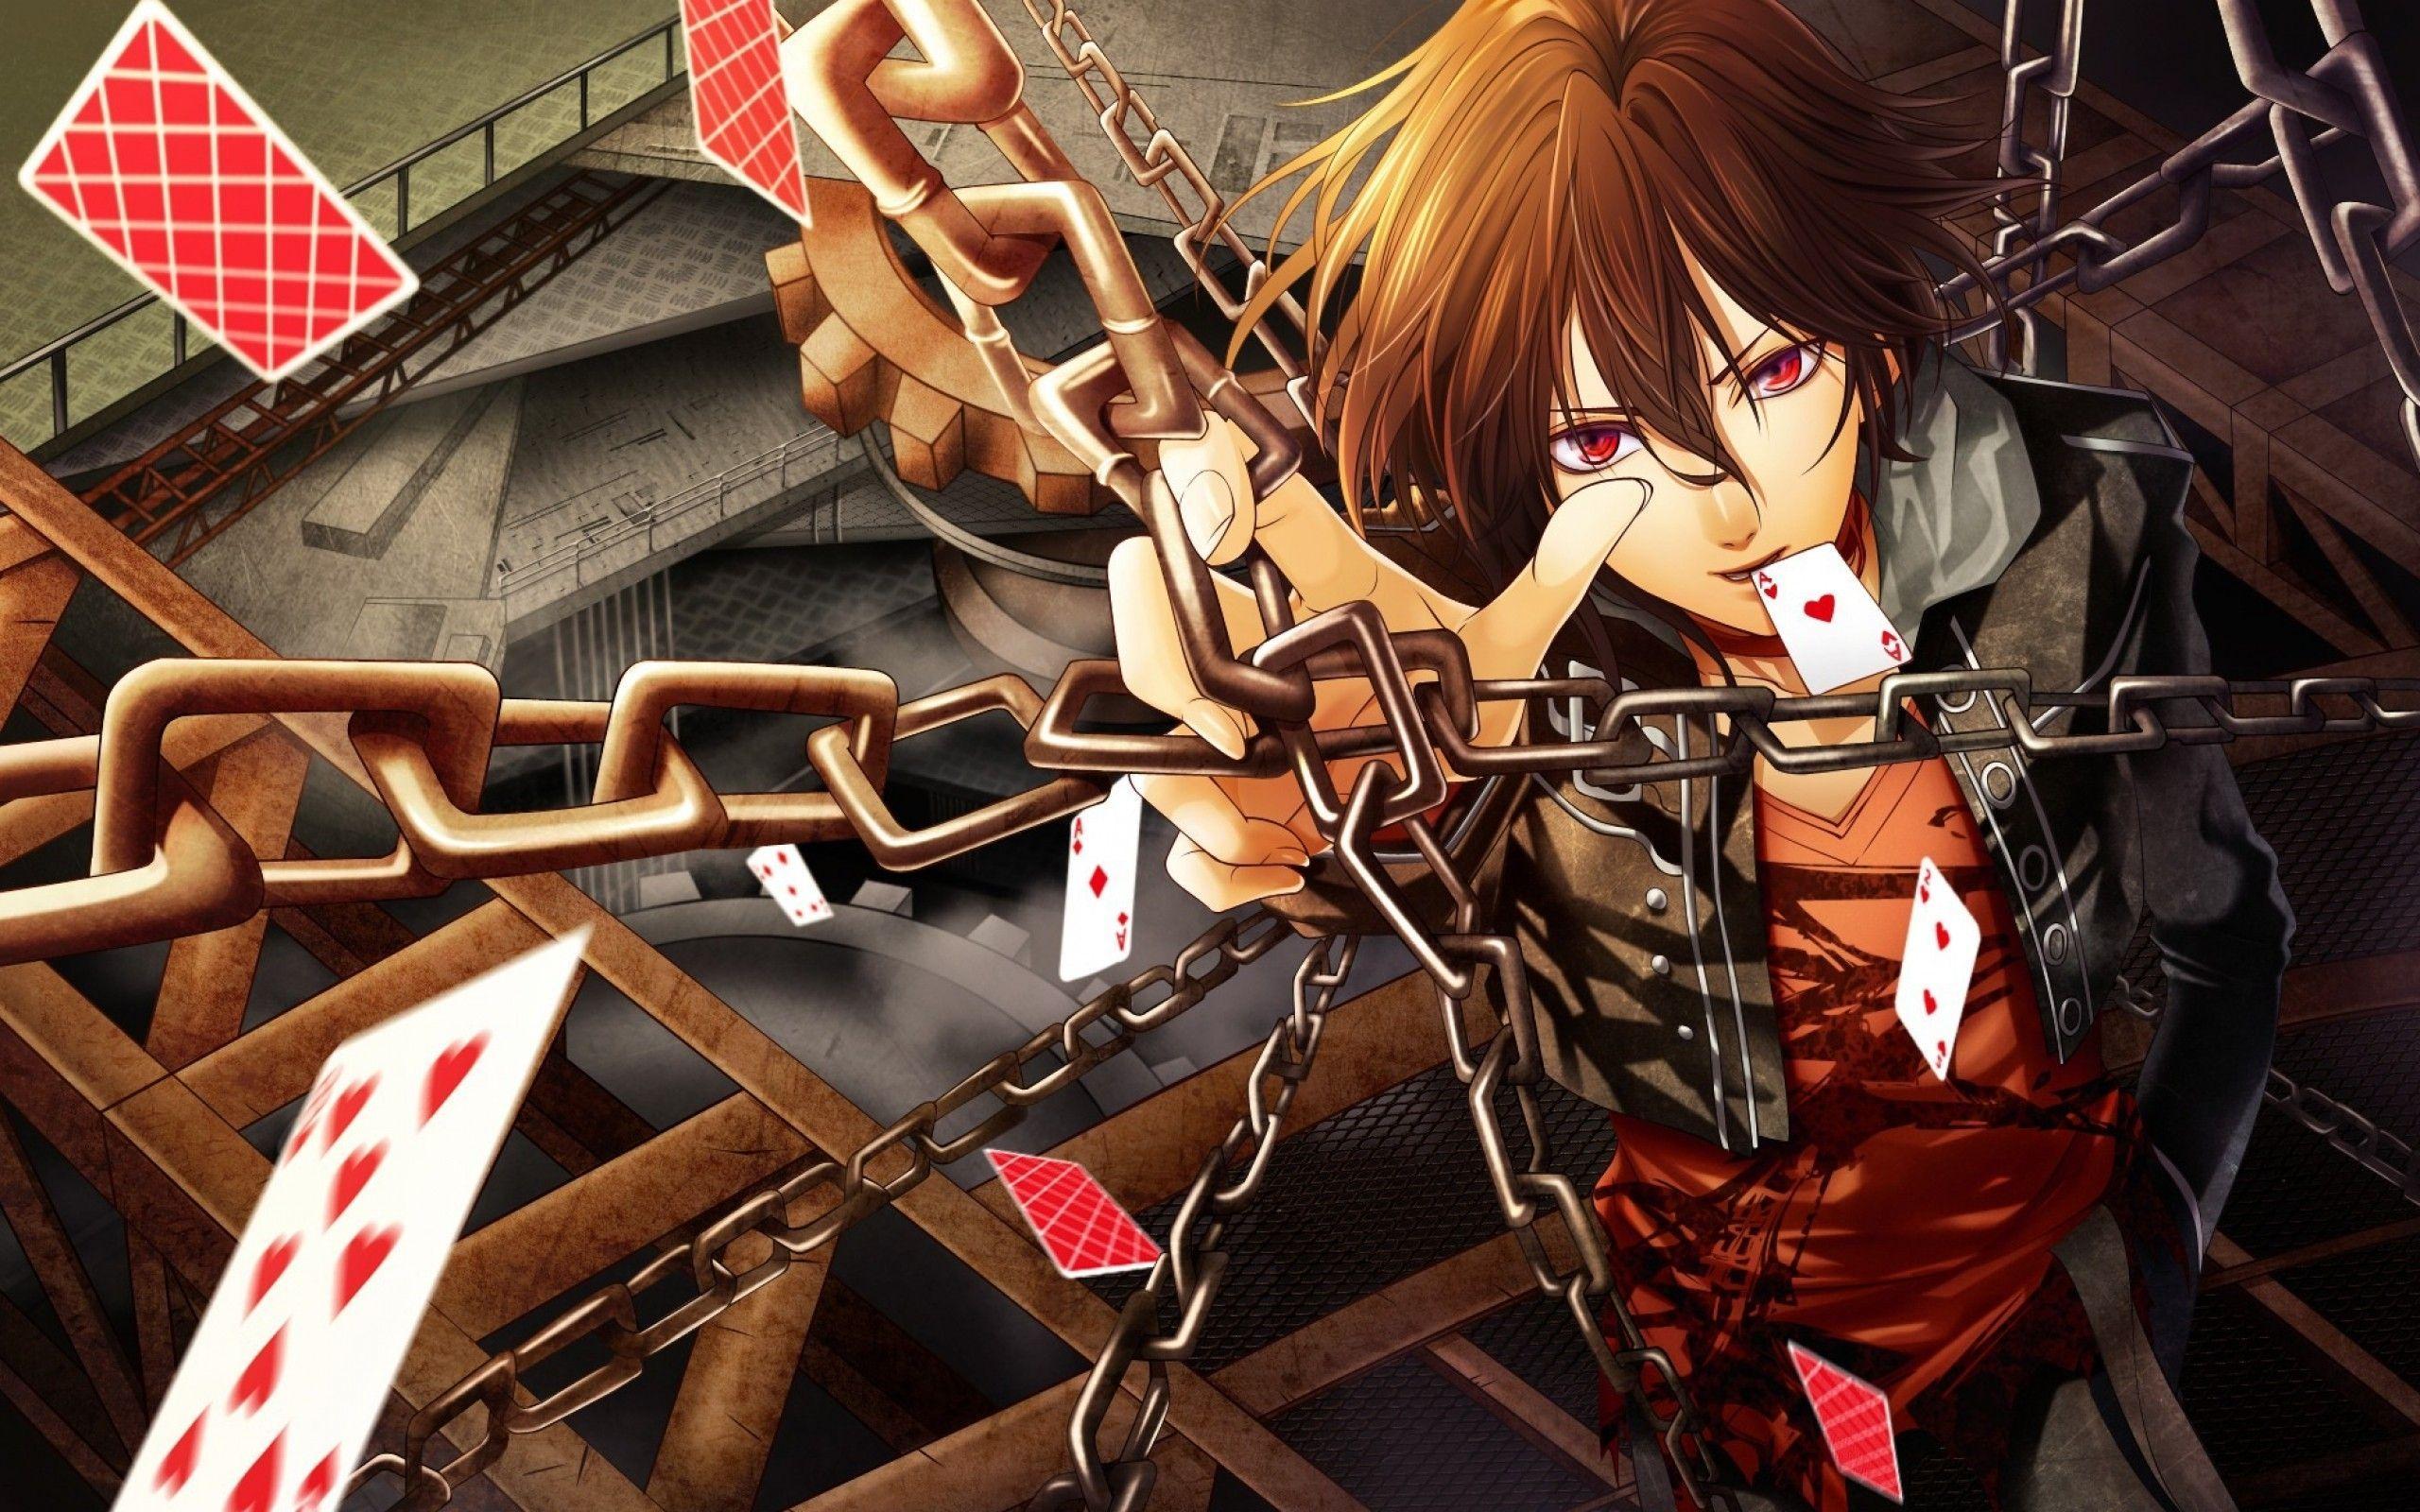 Anime Boy Desktop Wallpapers Top Free Anime Boy Desktop Backgrounds Wallpaperaccess